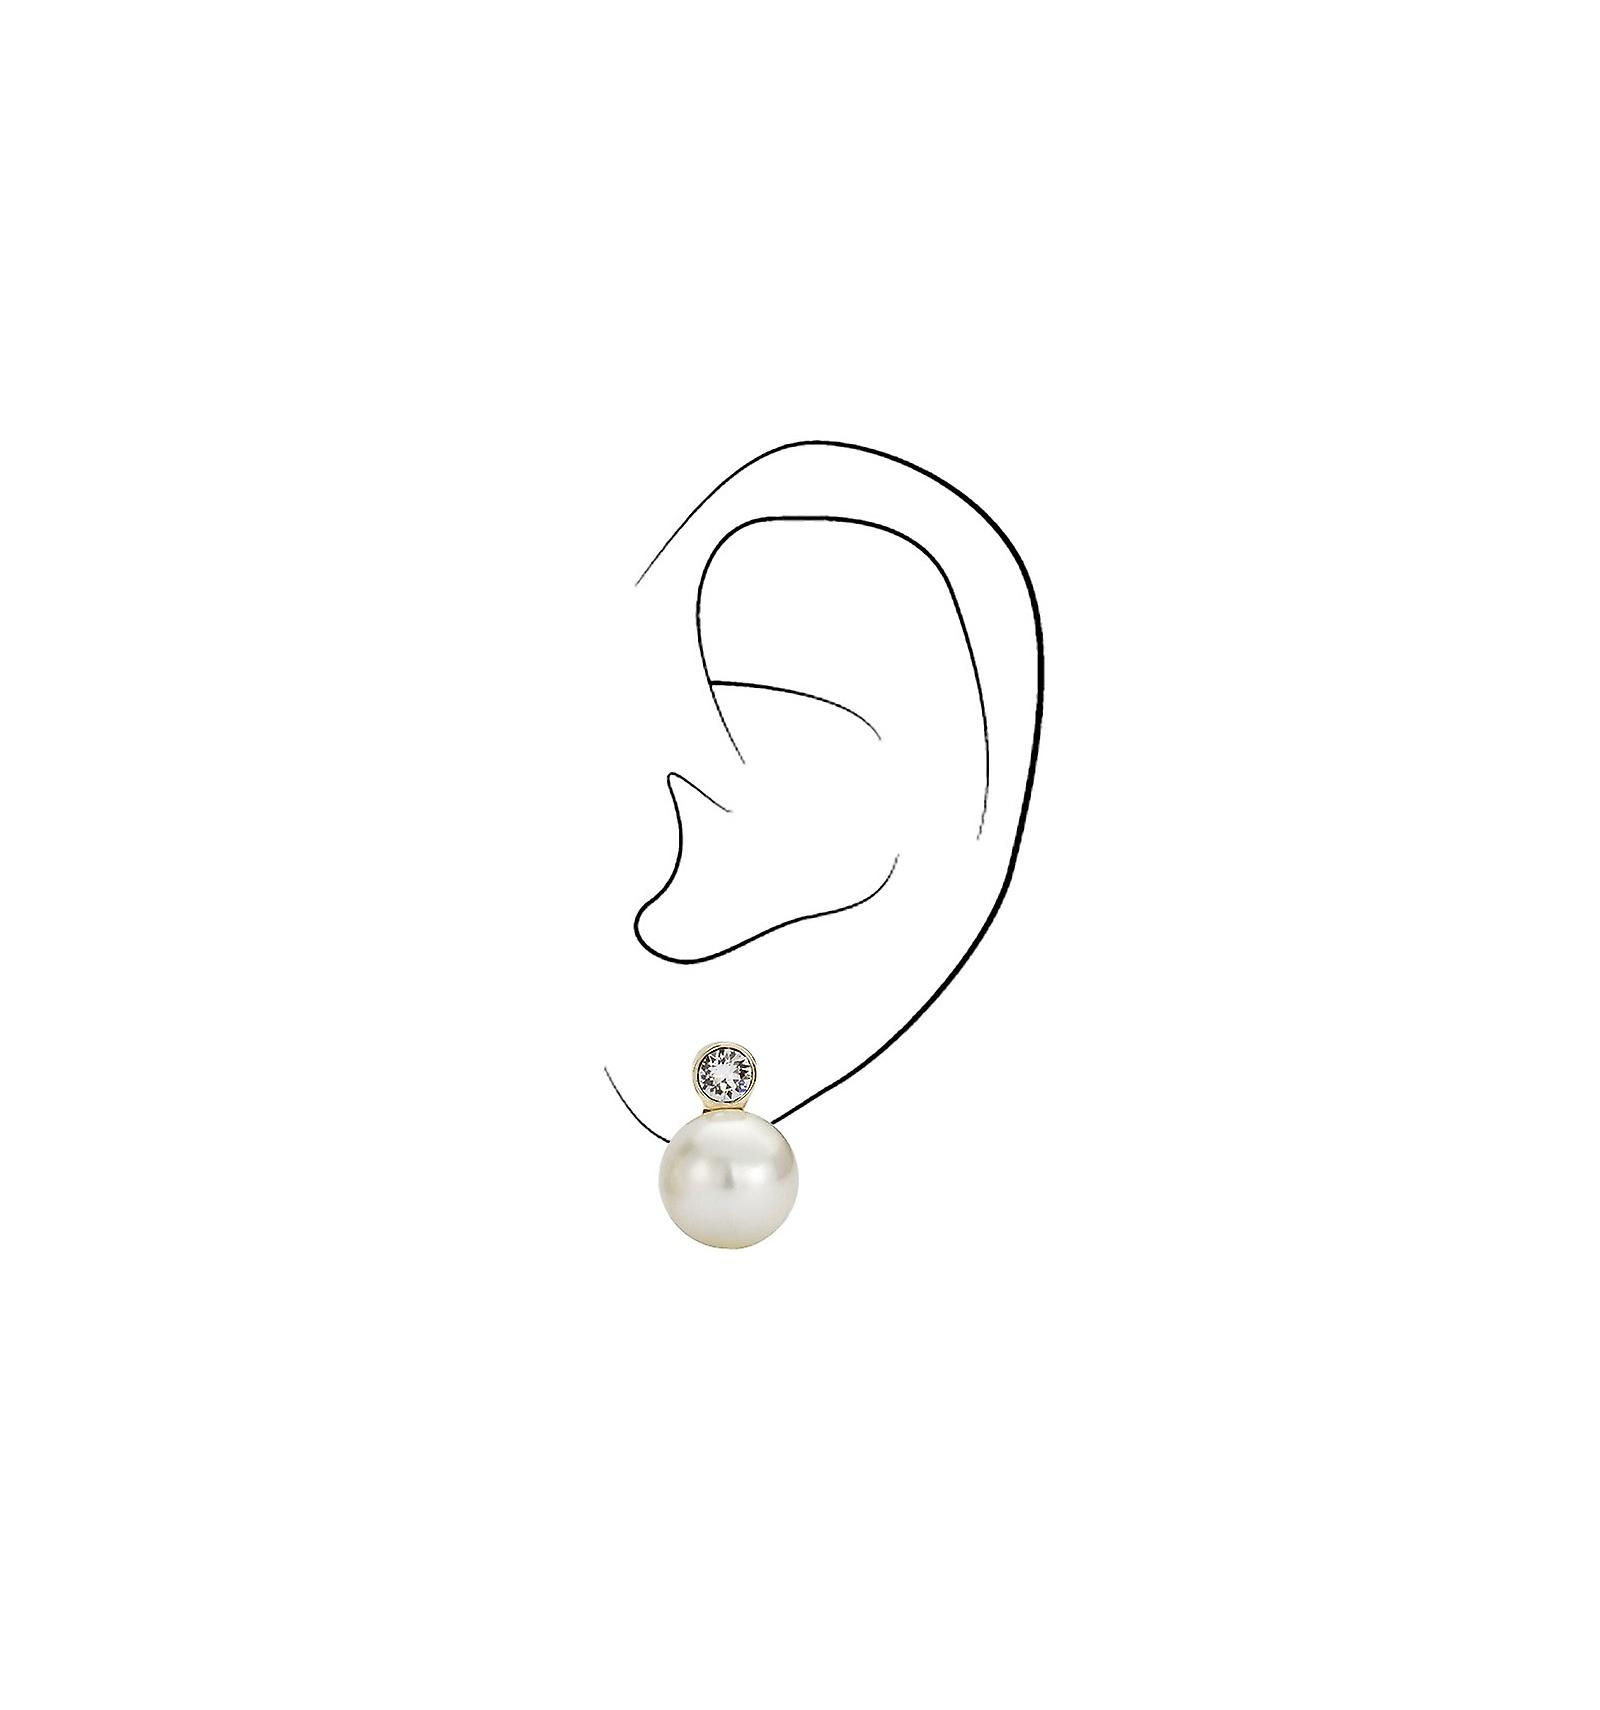 Reiziger clip Earring-12mm crème Pearl-22ct verguld-113486